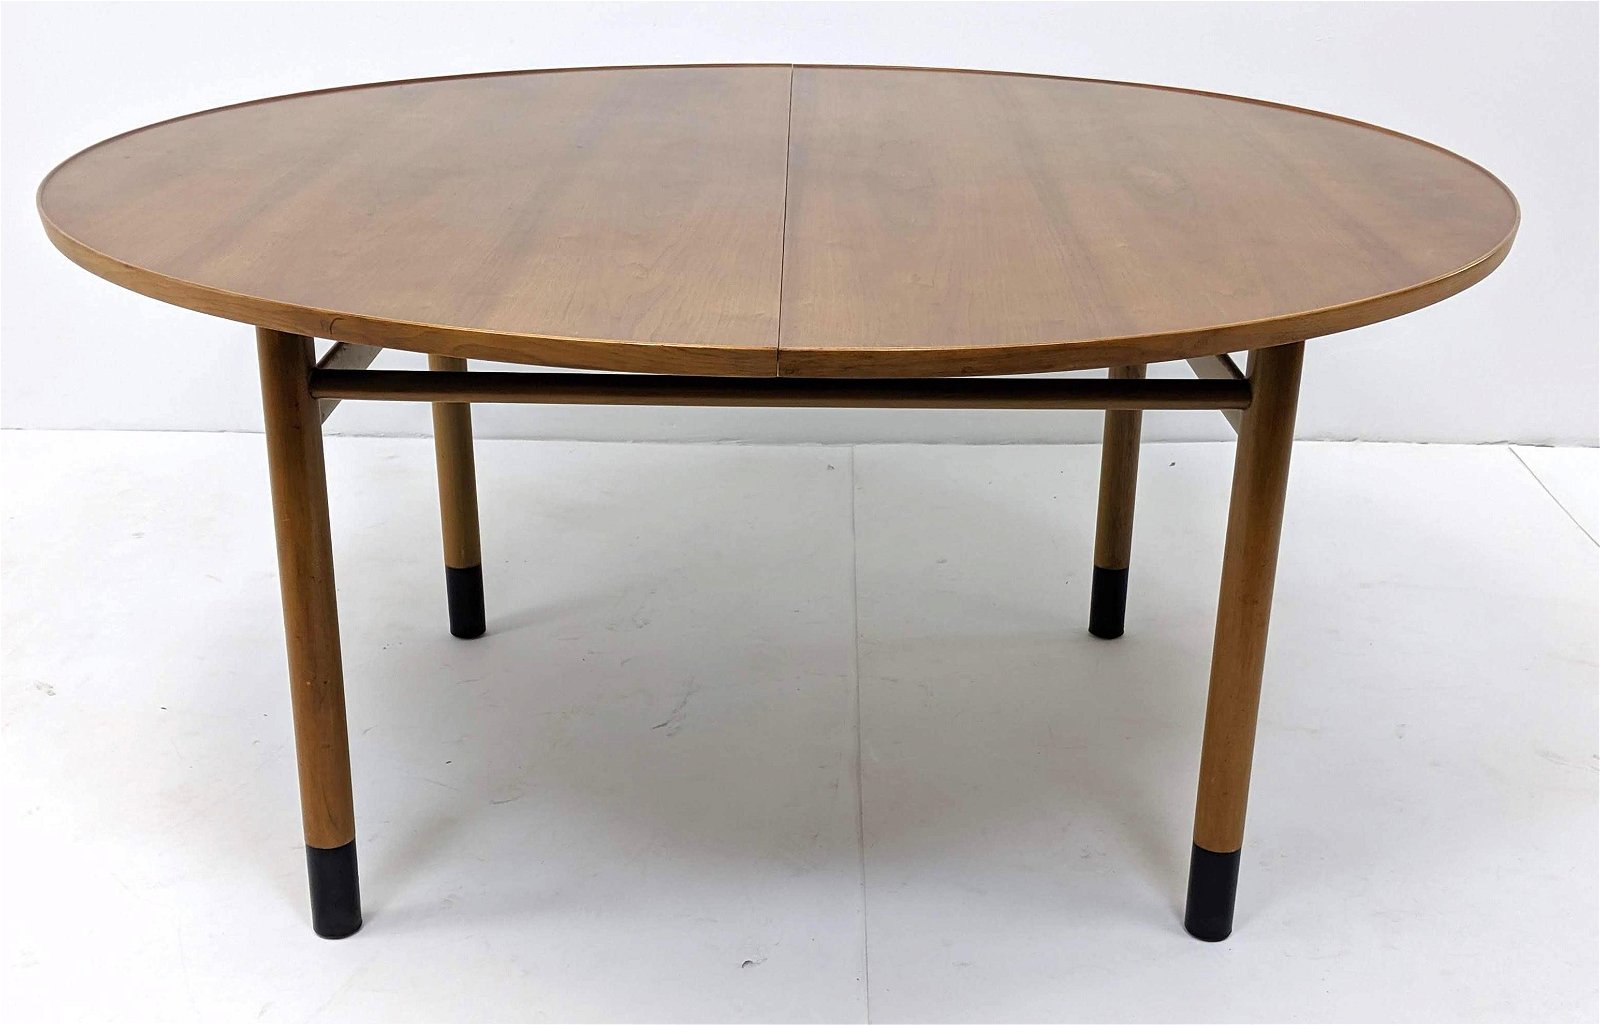 EDWARD WORMLEY for DUNBAR Round Modernist Dining Table.